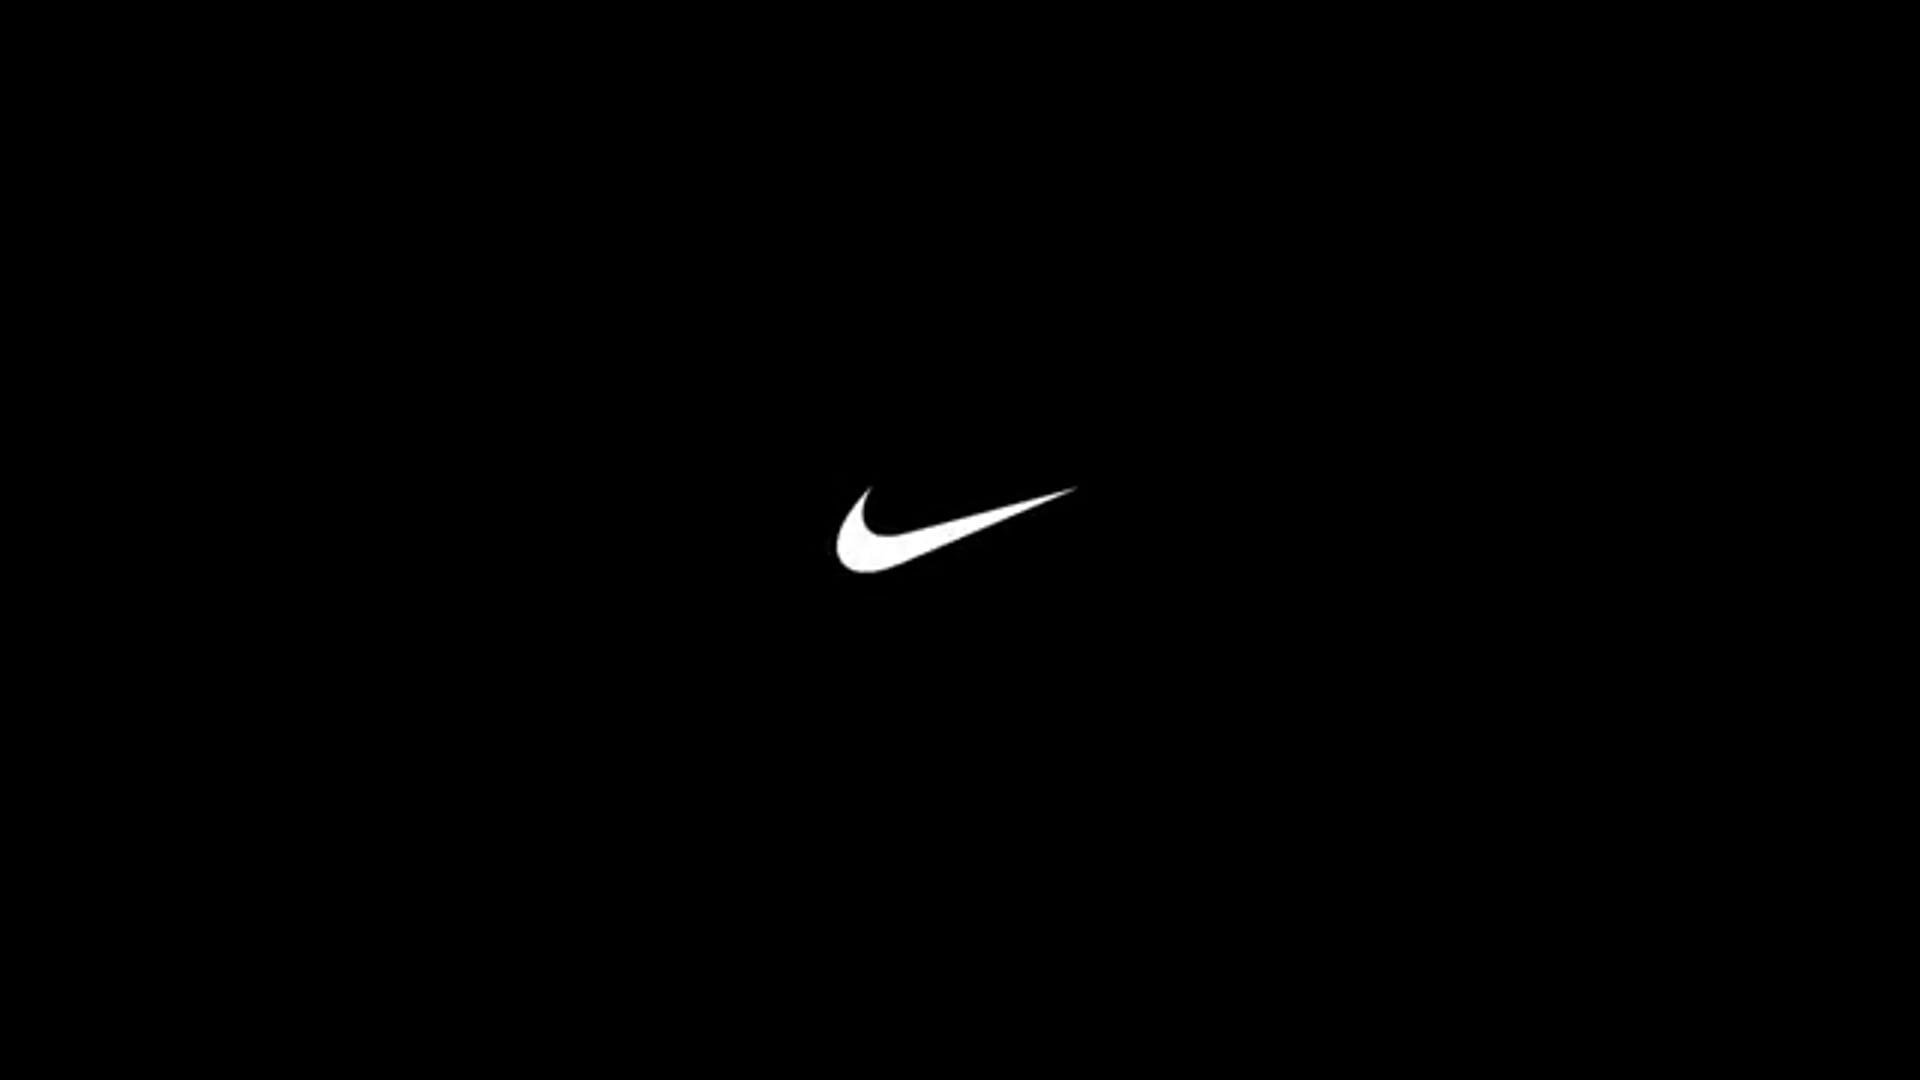 Nike: Lebron James More Than a Game